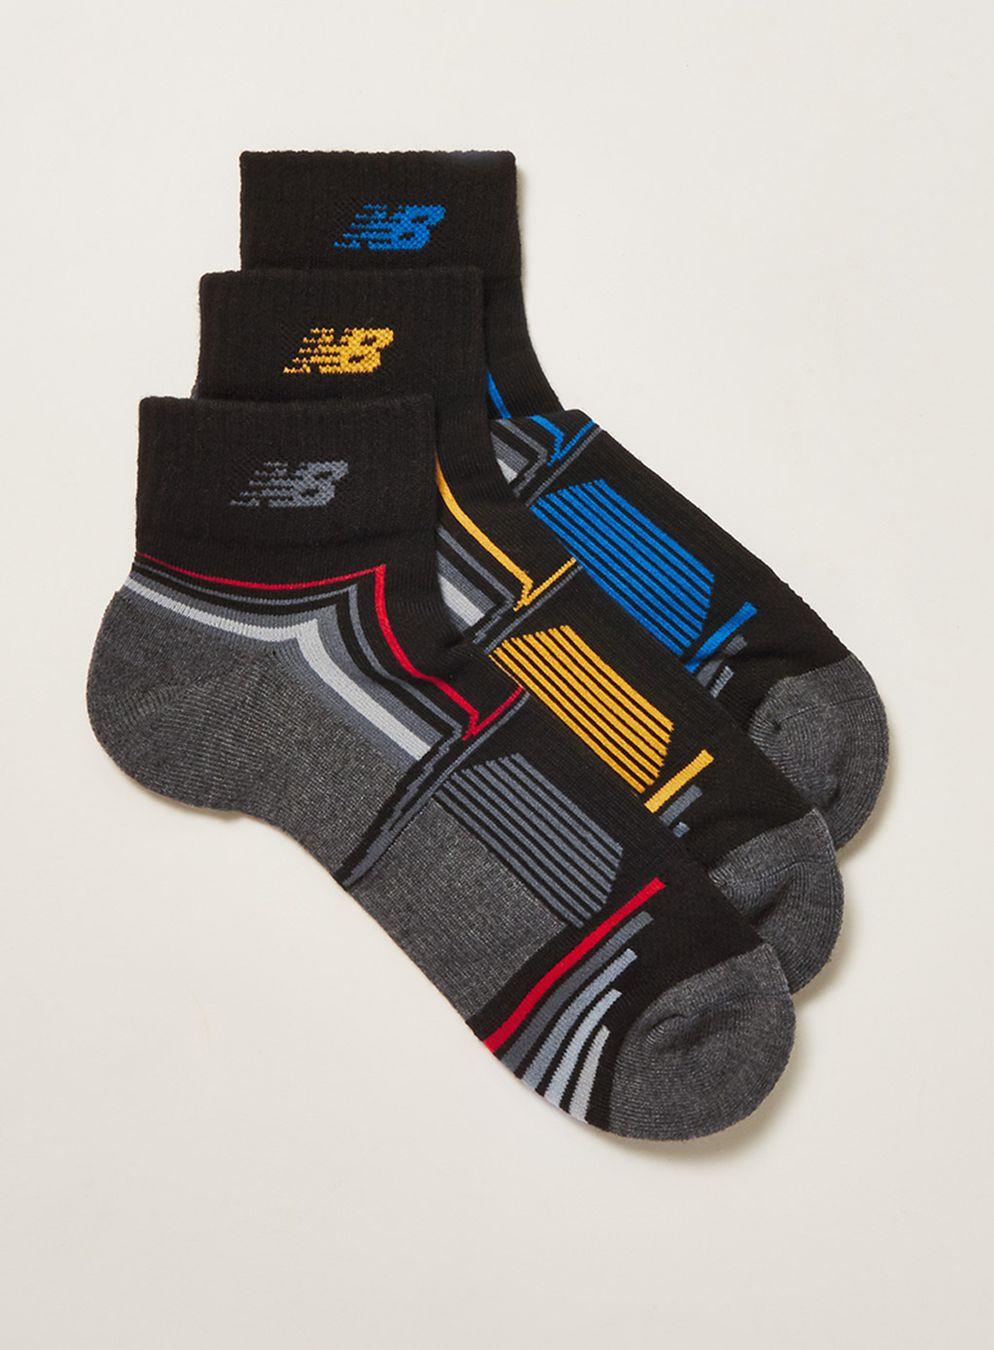 Topman online New Balance Black 3 Pack Socks £2 - free c&c